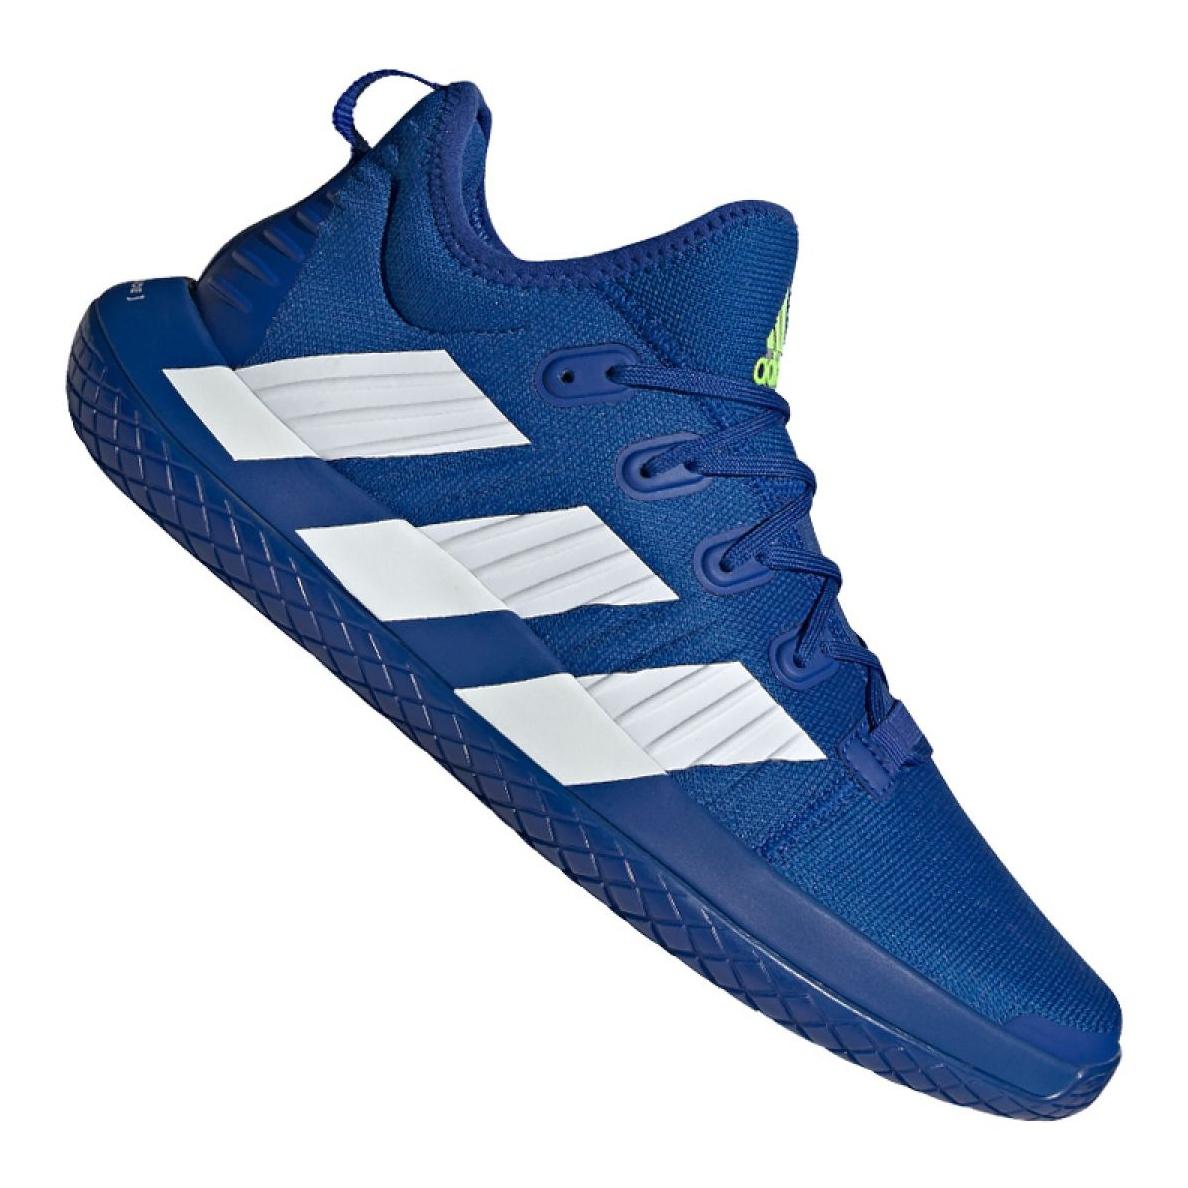 Indoor shoes adidas Stabil Next Gen M FU8316 multicolored blue